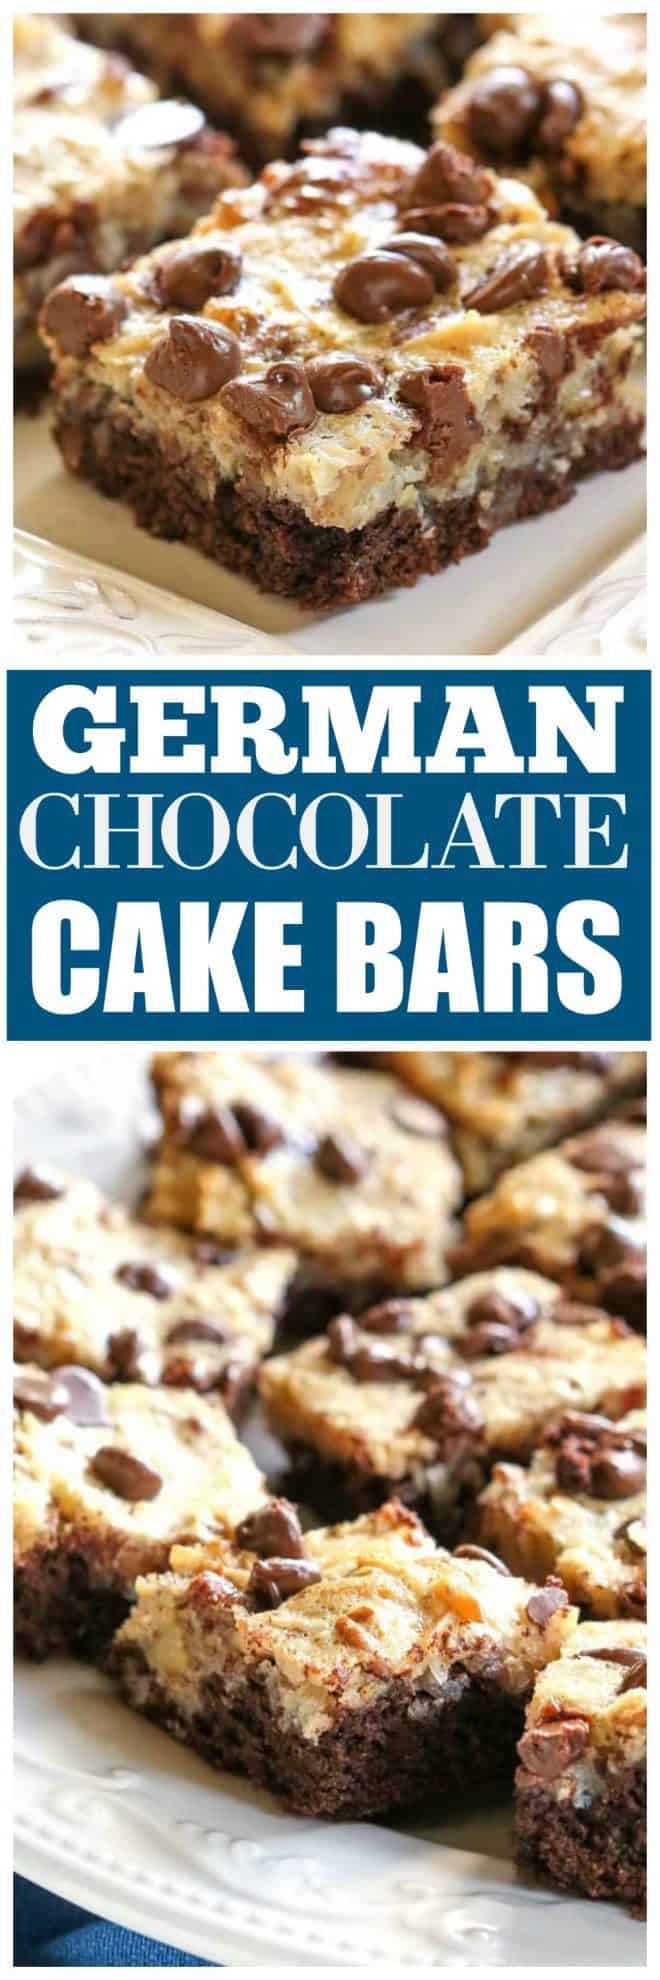 German Chocolate Cake Bars The Girl Who Ate Everything